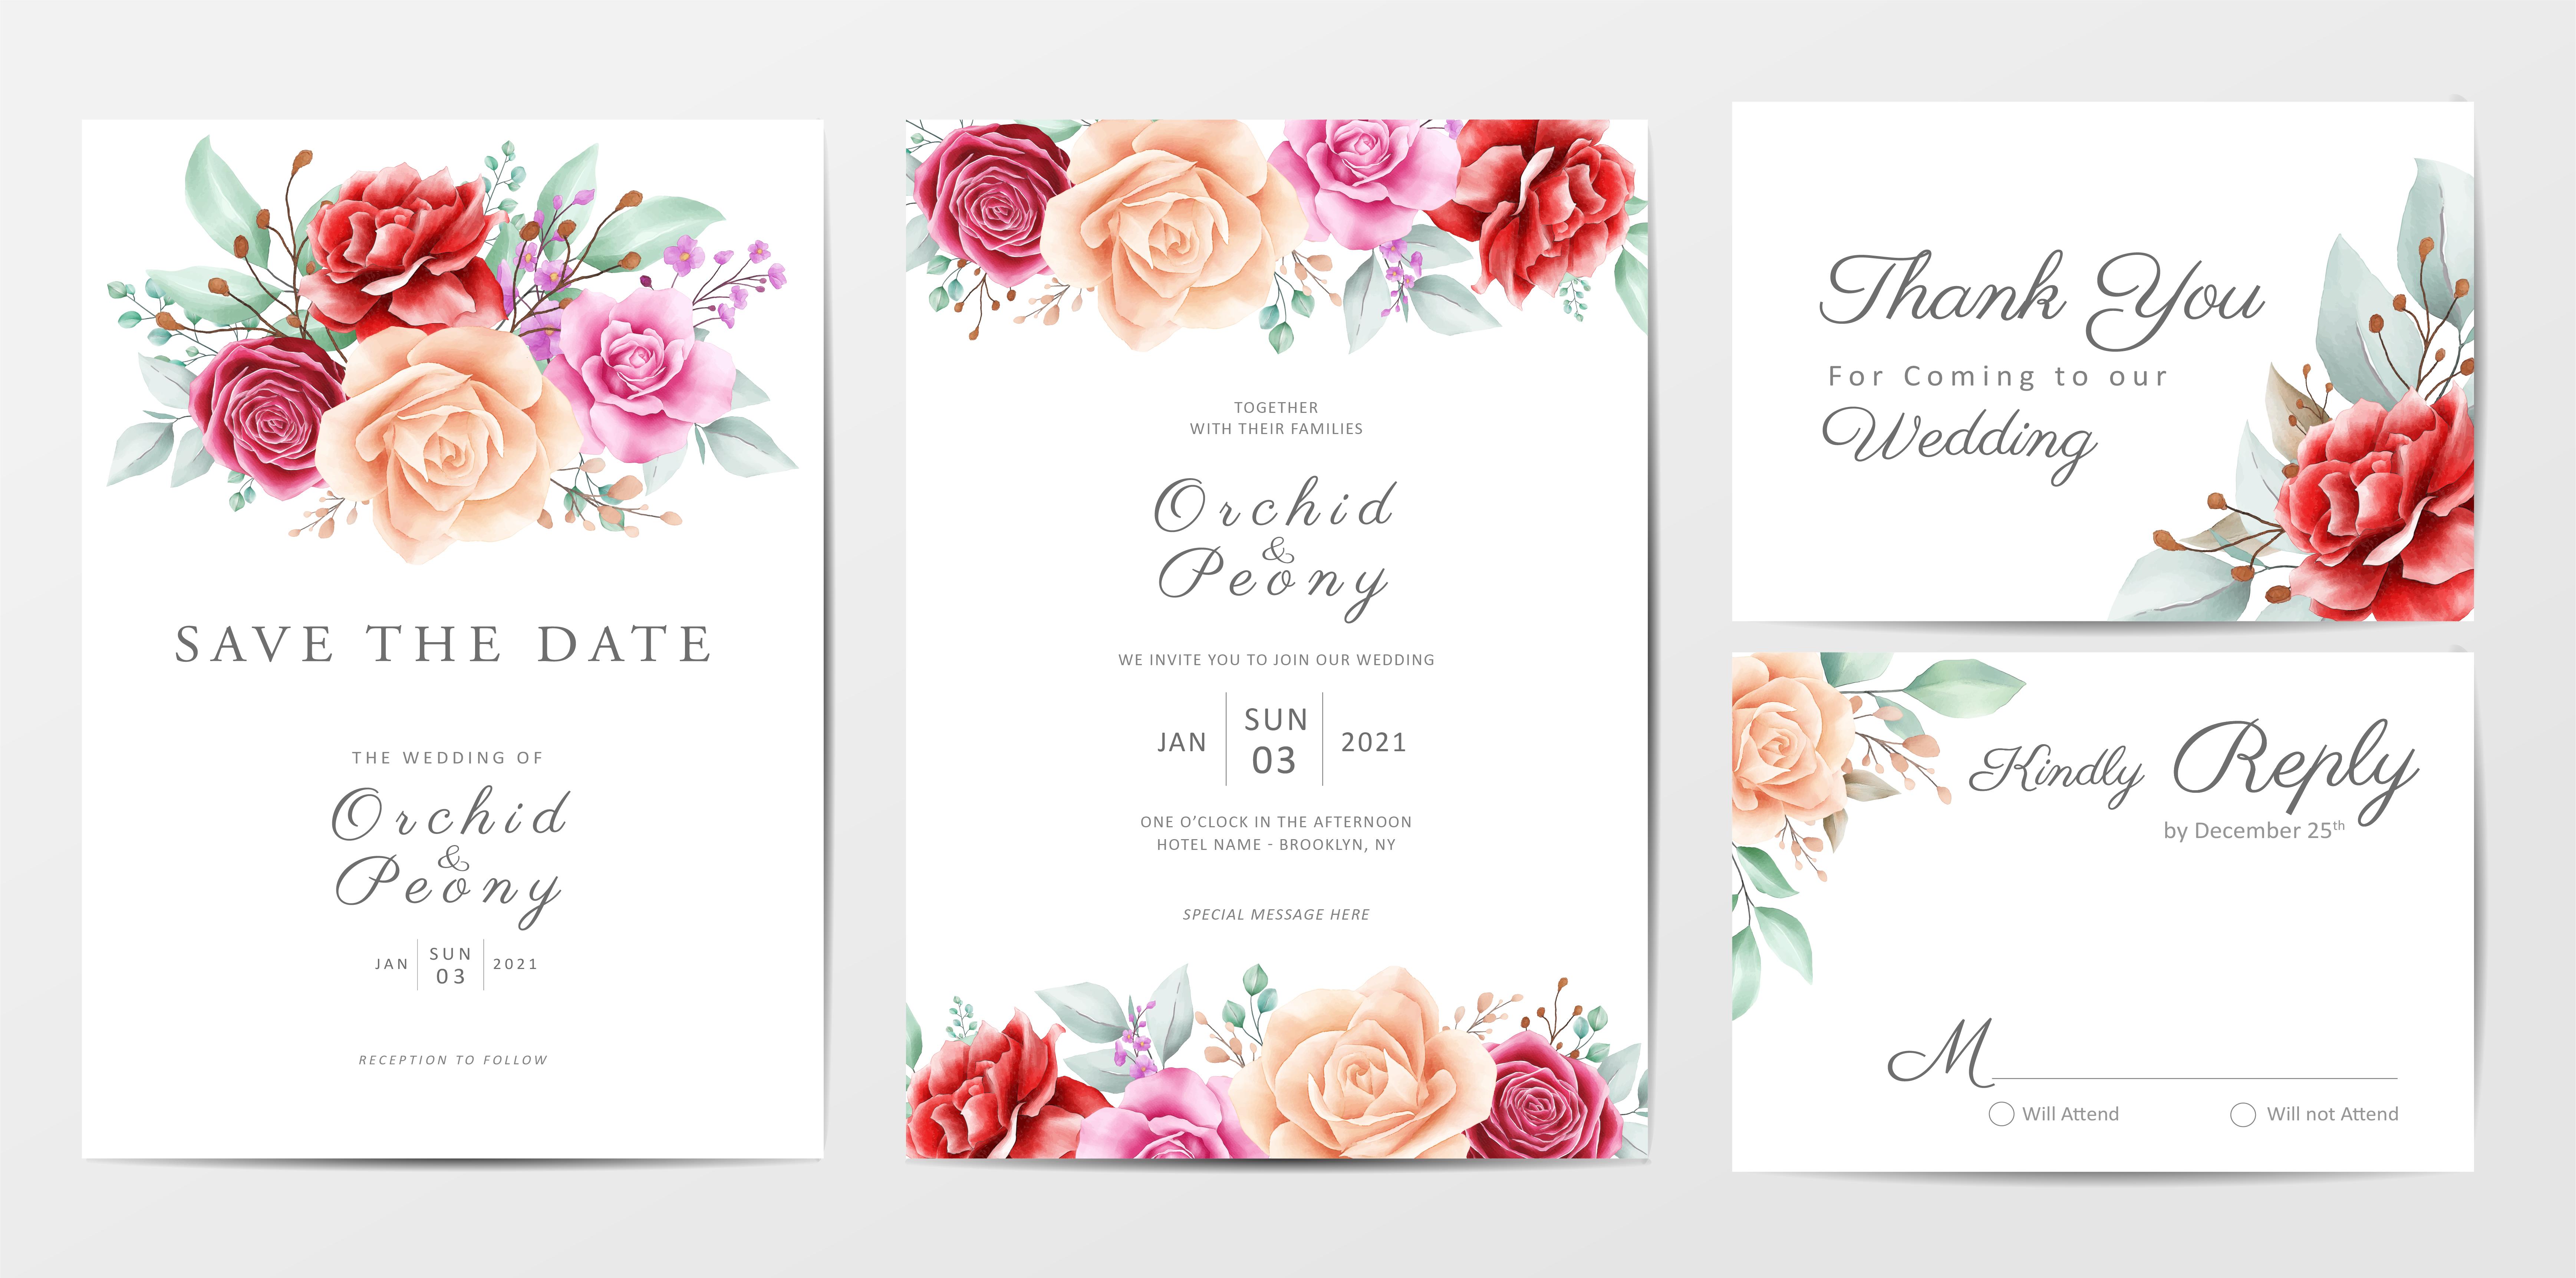 floral wedding invitation cards template set 673328 vector